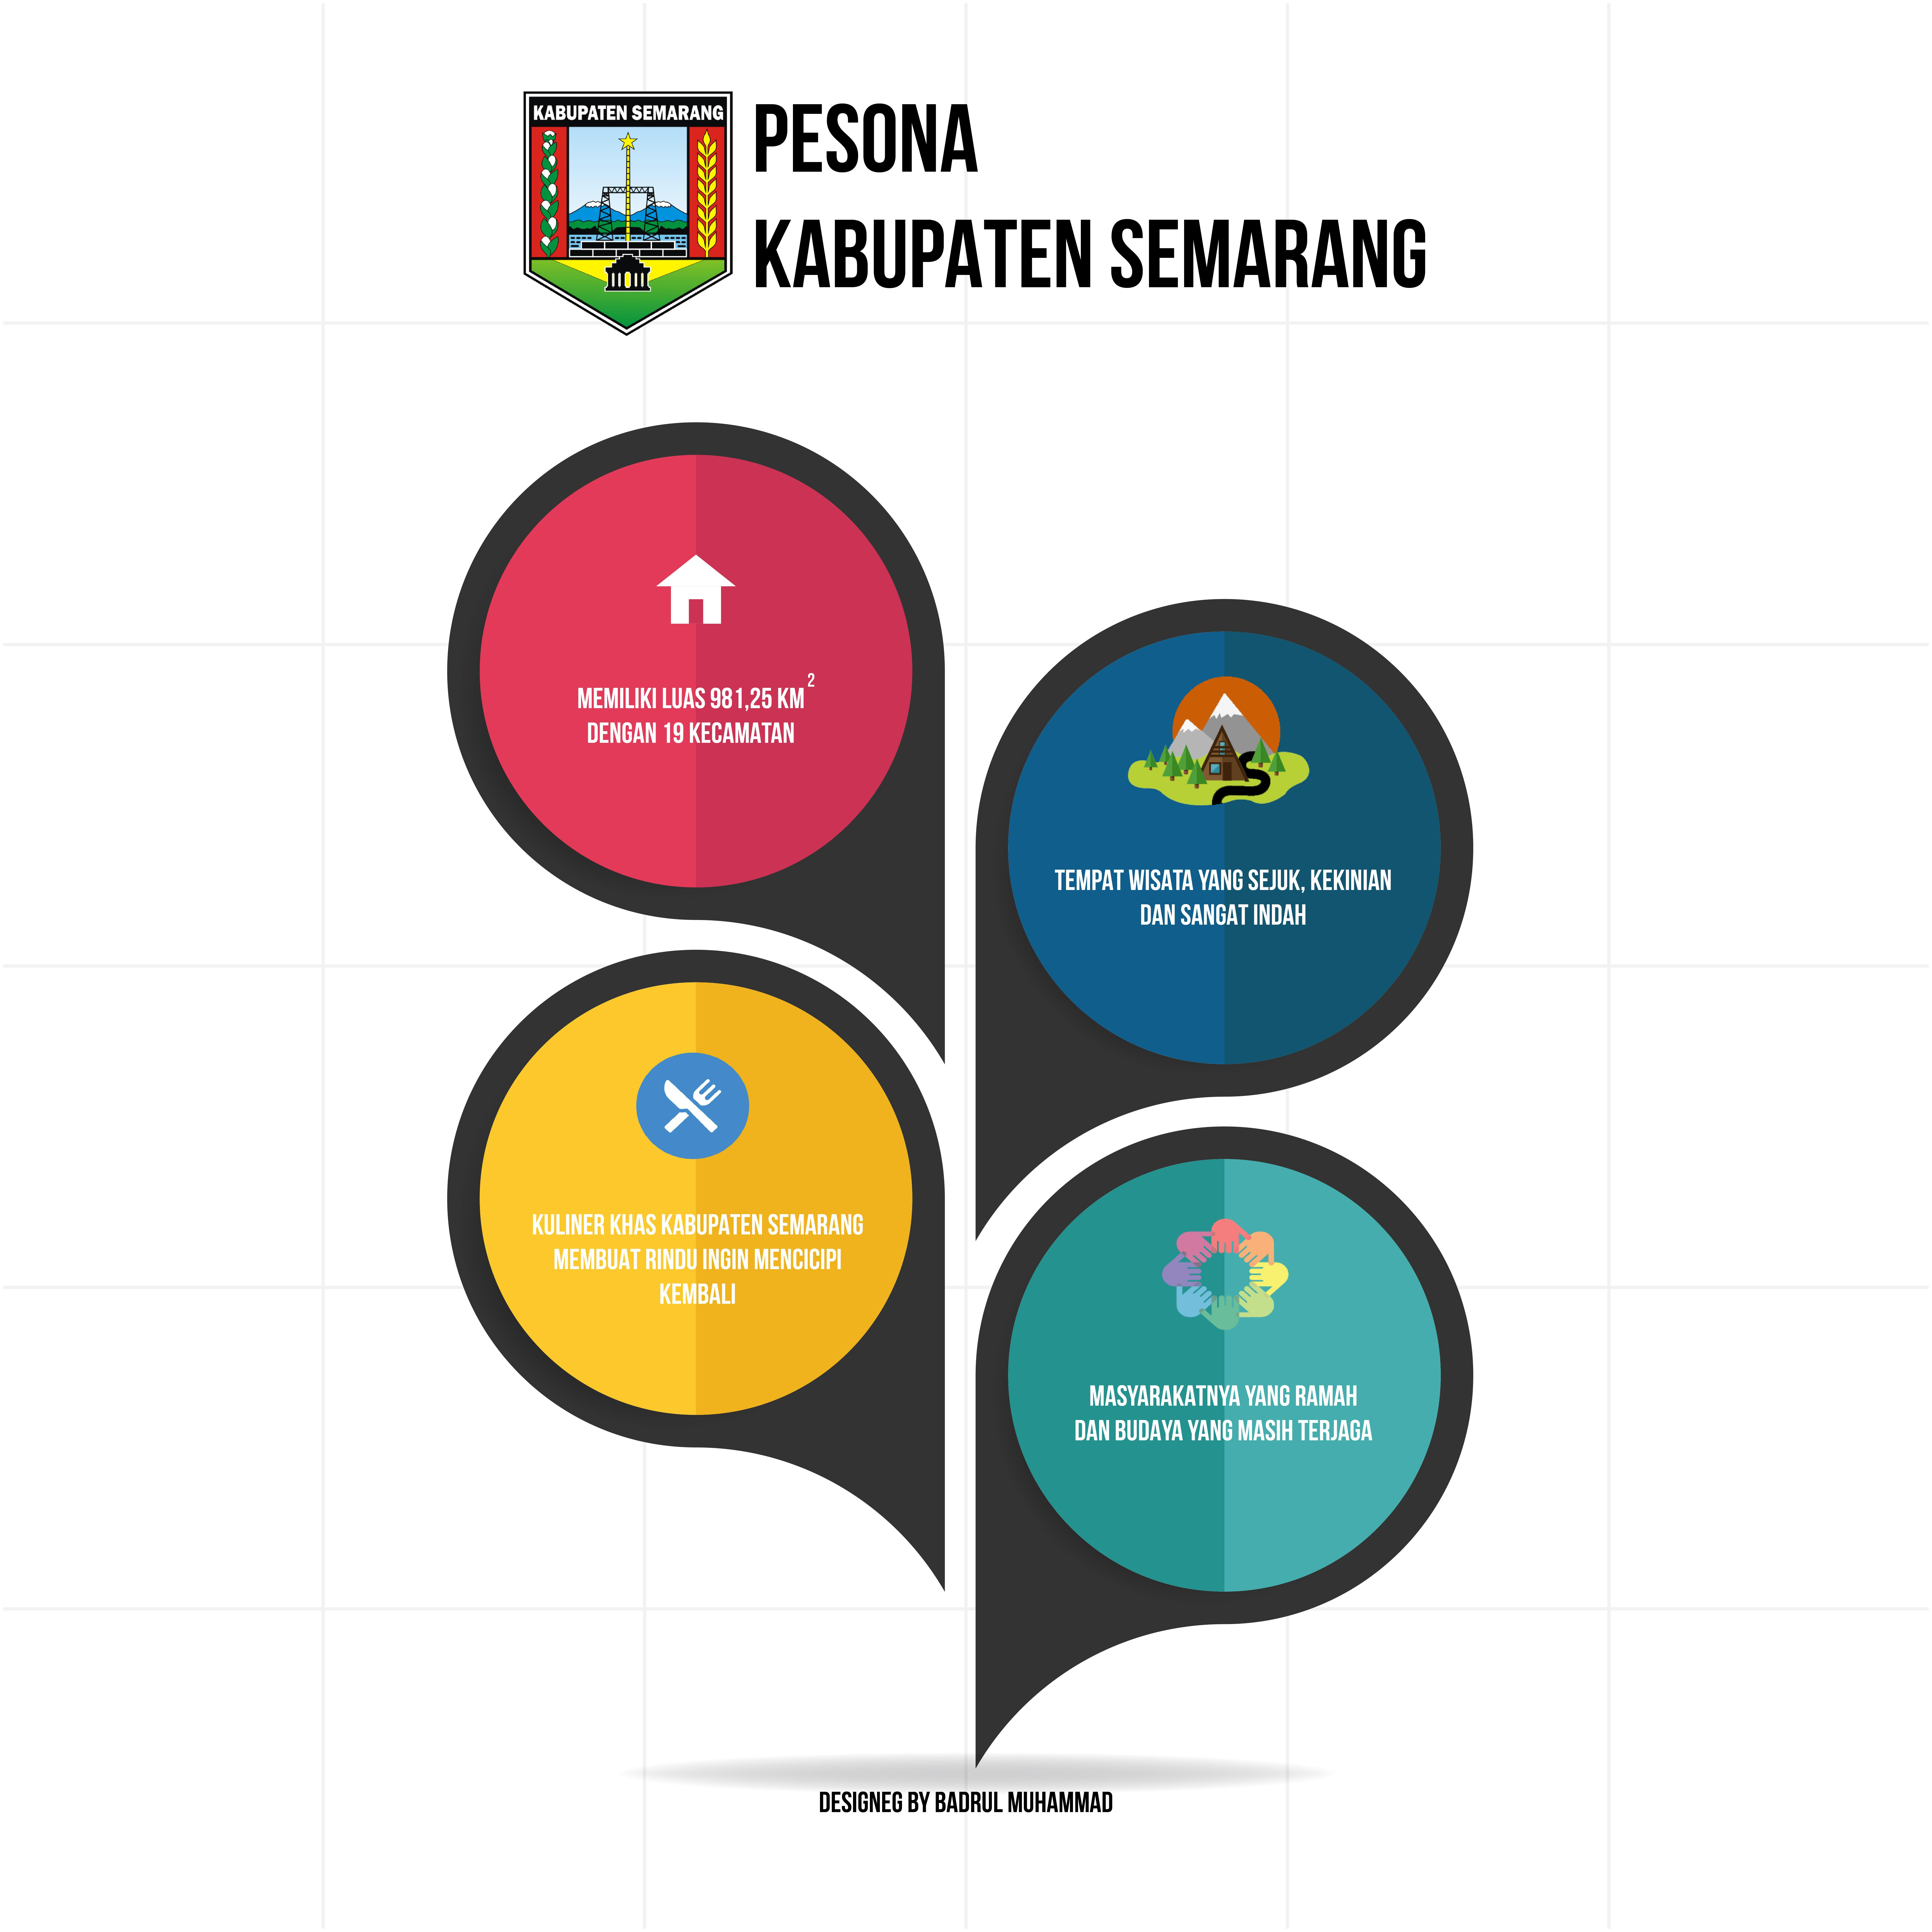 pesona kabupaten semarang by badrulmuhammad